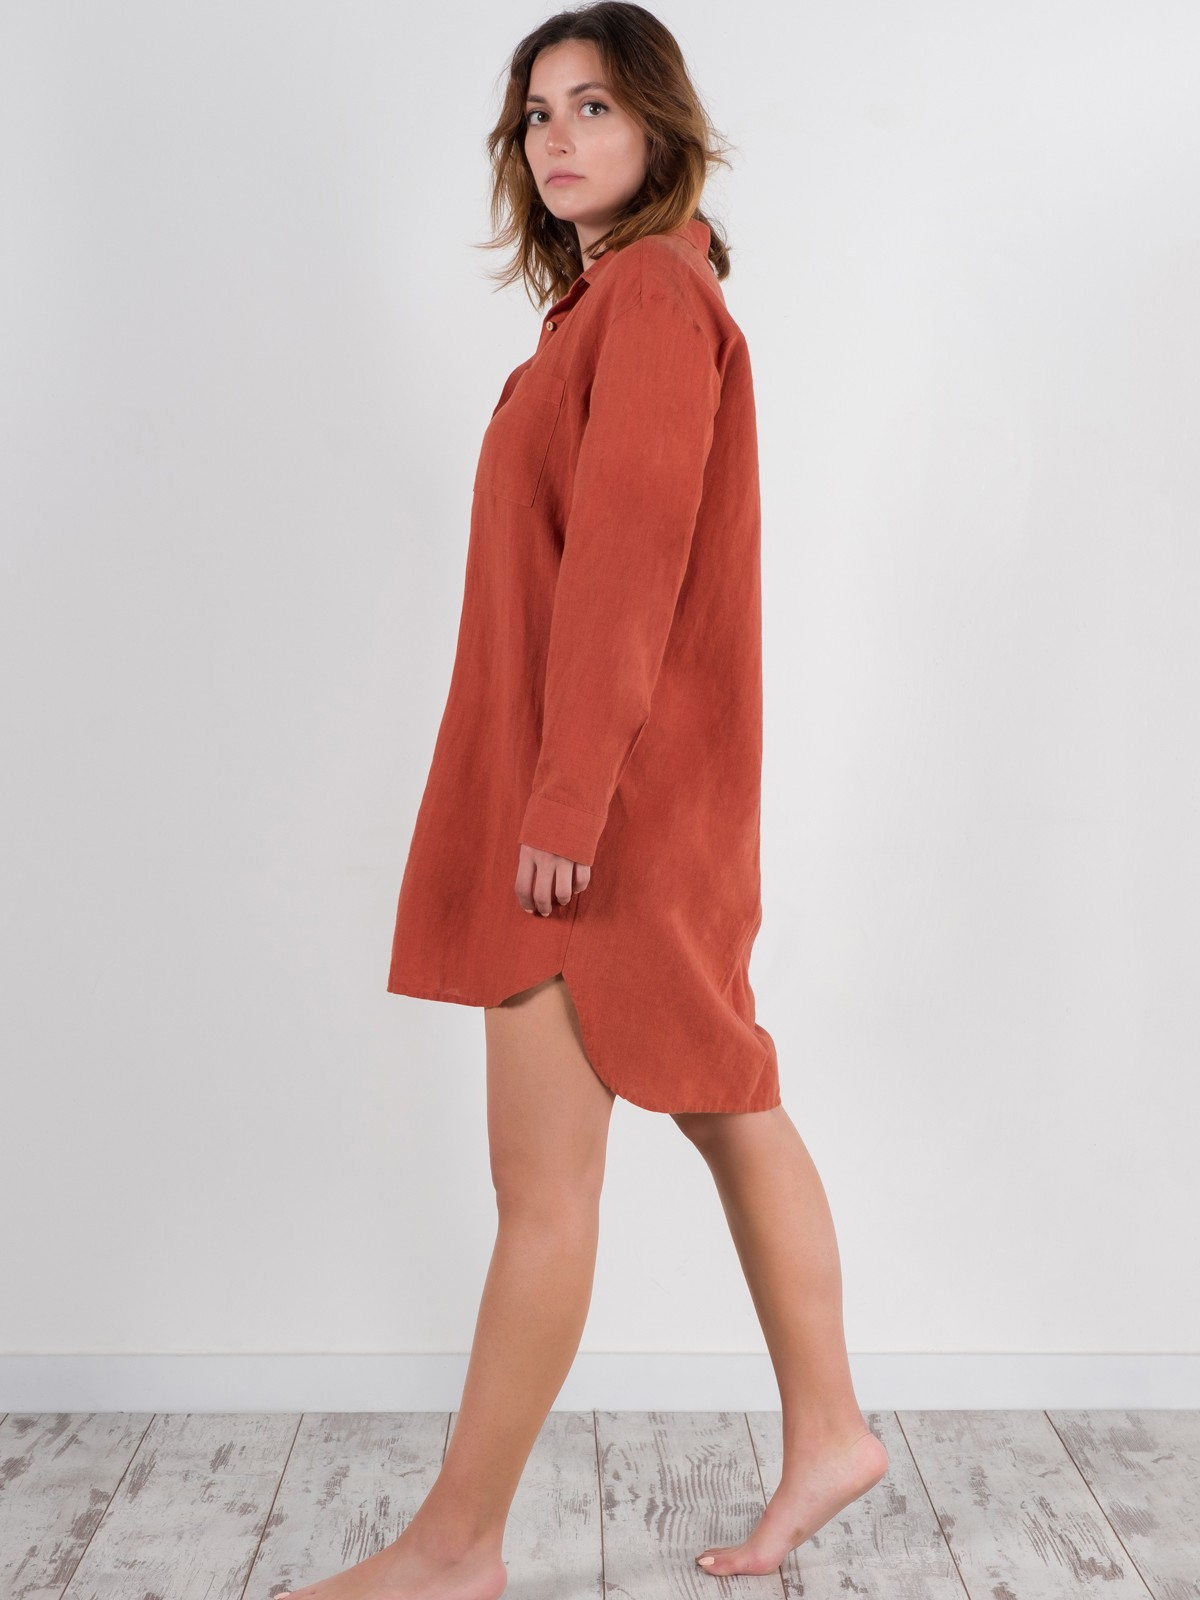 turuncu-gomlek-elbise2-1200x1600w